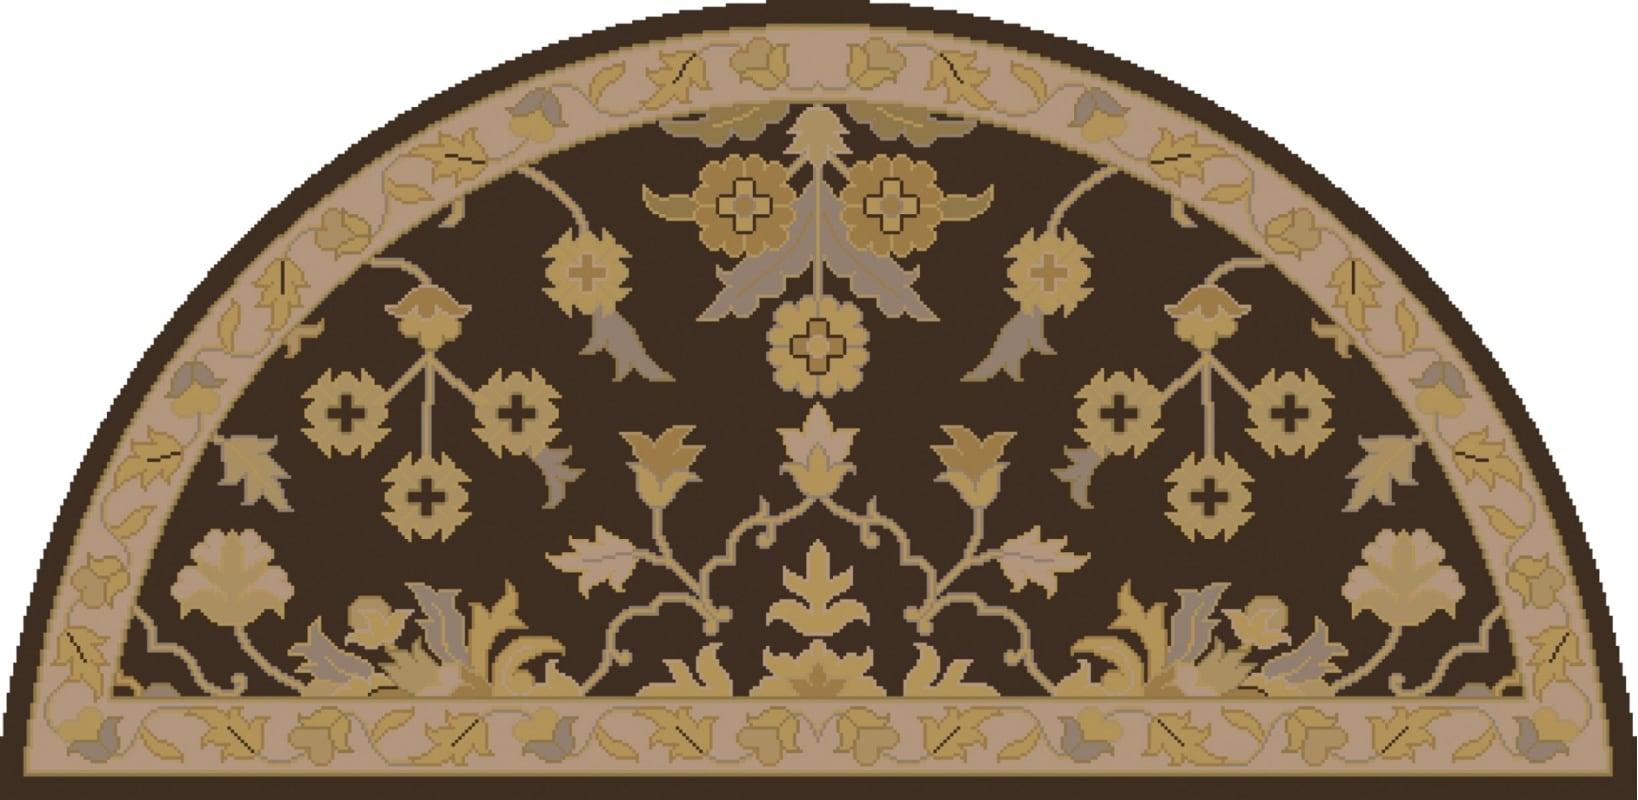 Surya CAE-1151 Caesar Hand Tufted Wool Rug Brown 2 x 4 Hearth Home